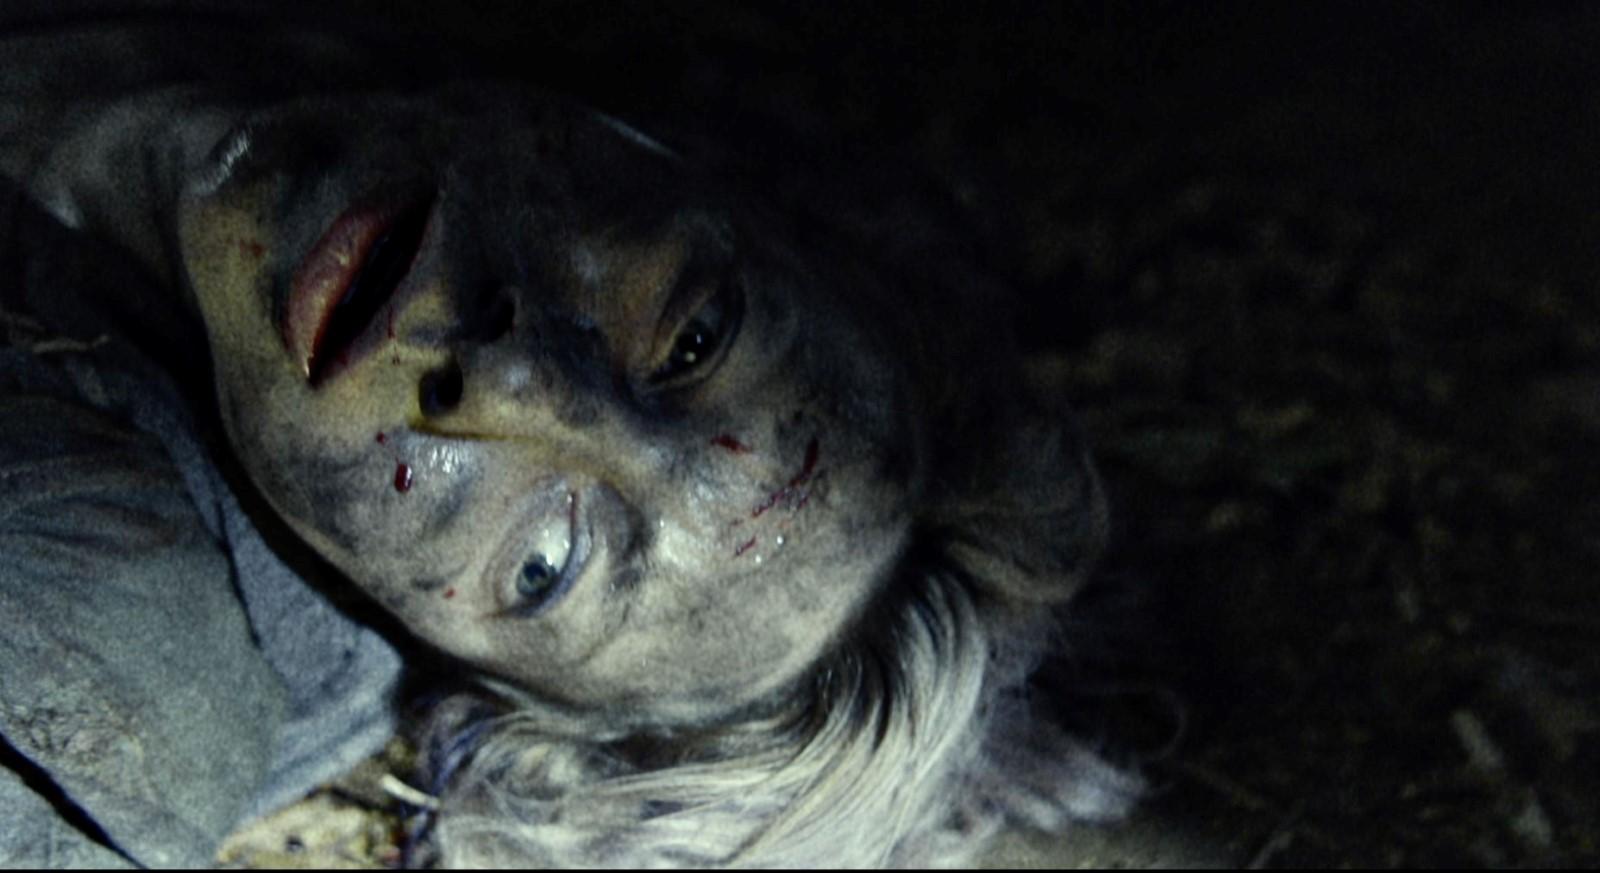 Bruxa de Blair ainda assusta